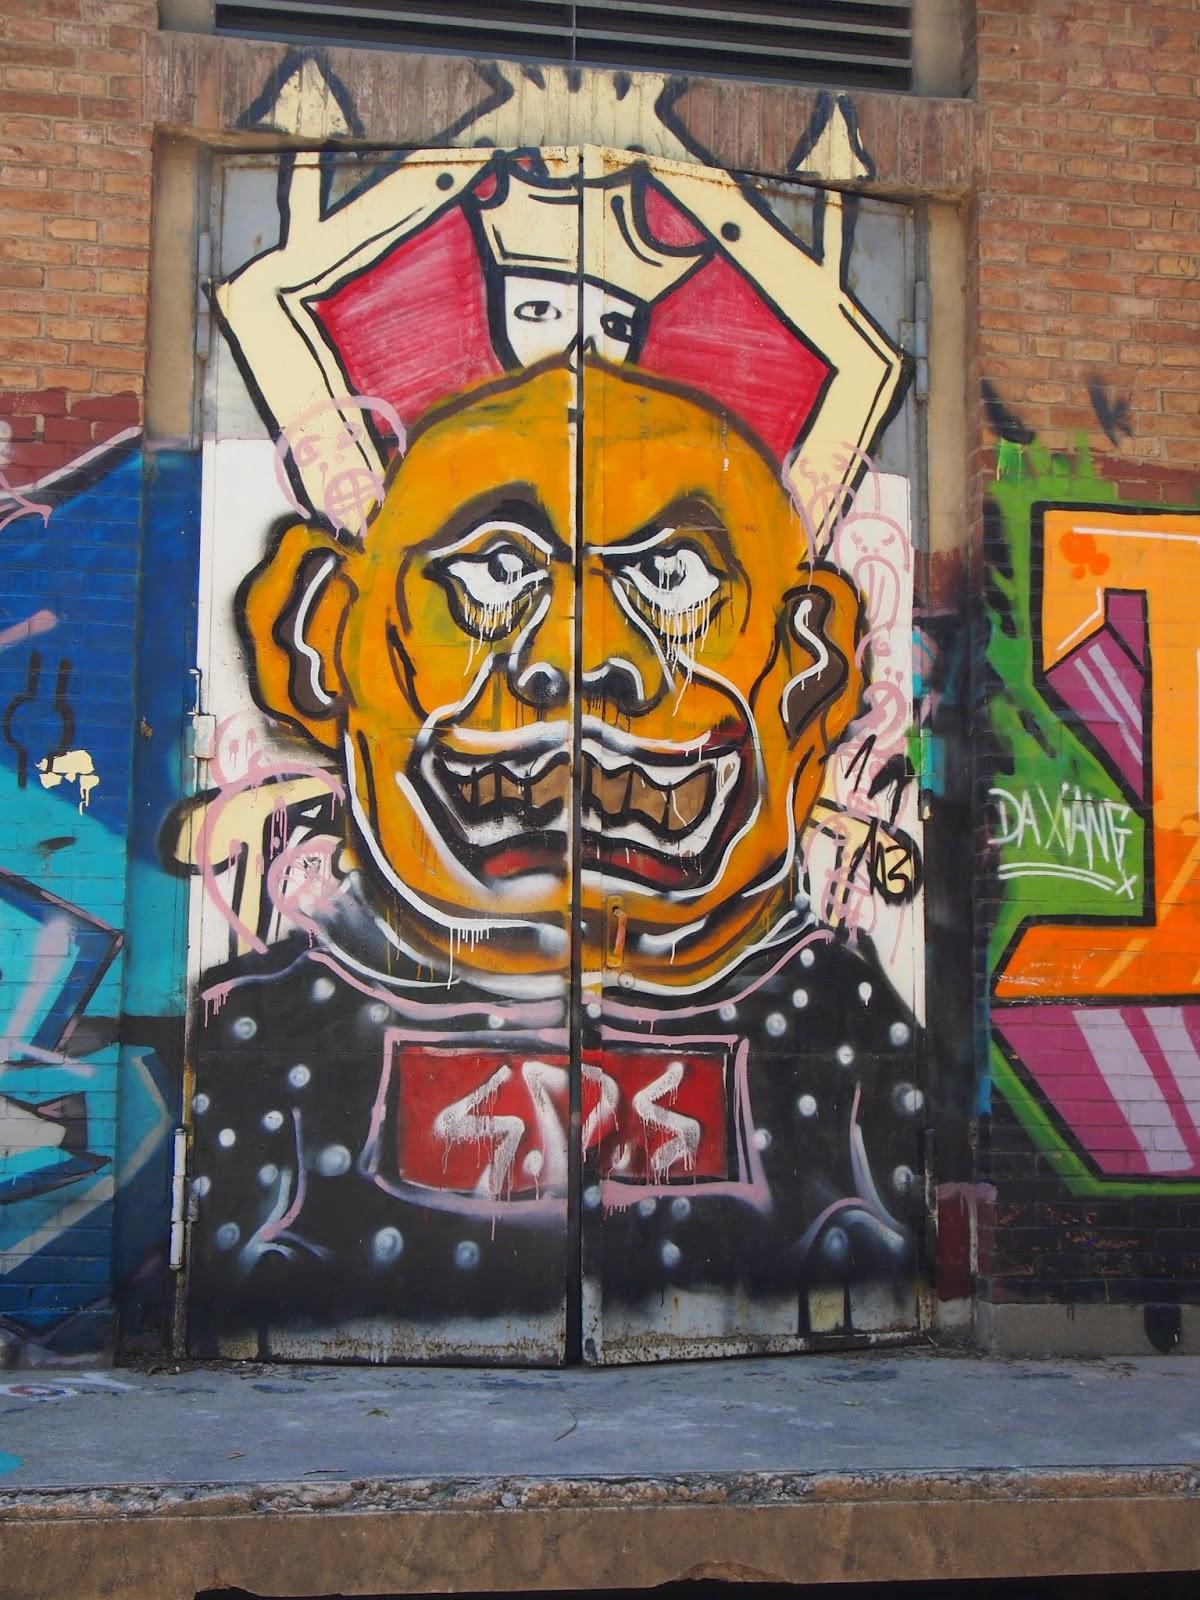 sultan street art in the 798 art district